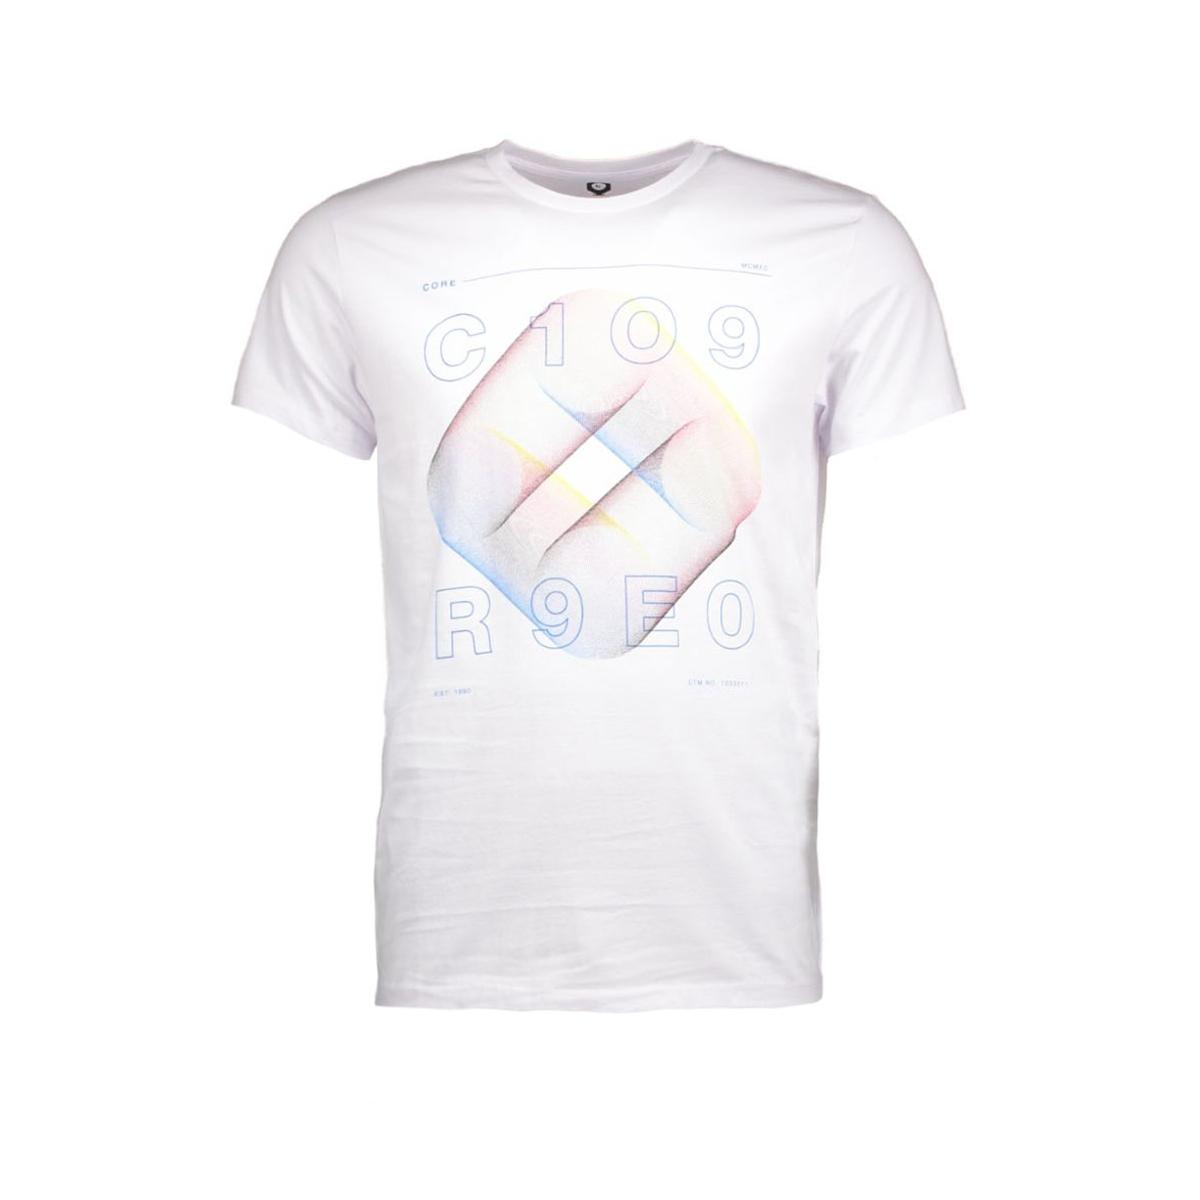 jcofloat-belkin tee ss o-neck camp 12108922 jack & jones t-shirt white/tall&slim